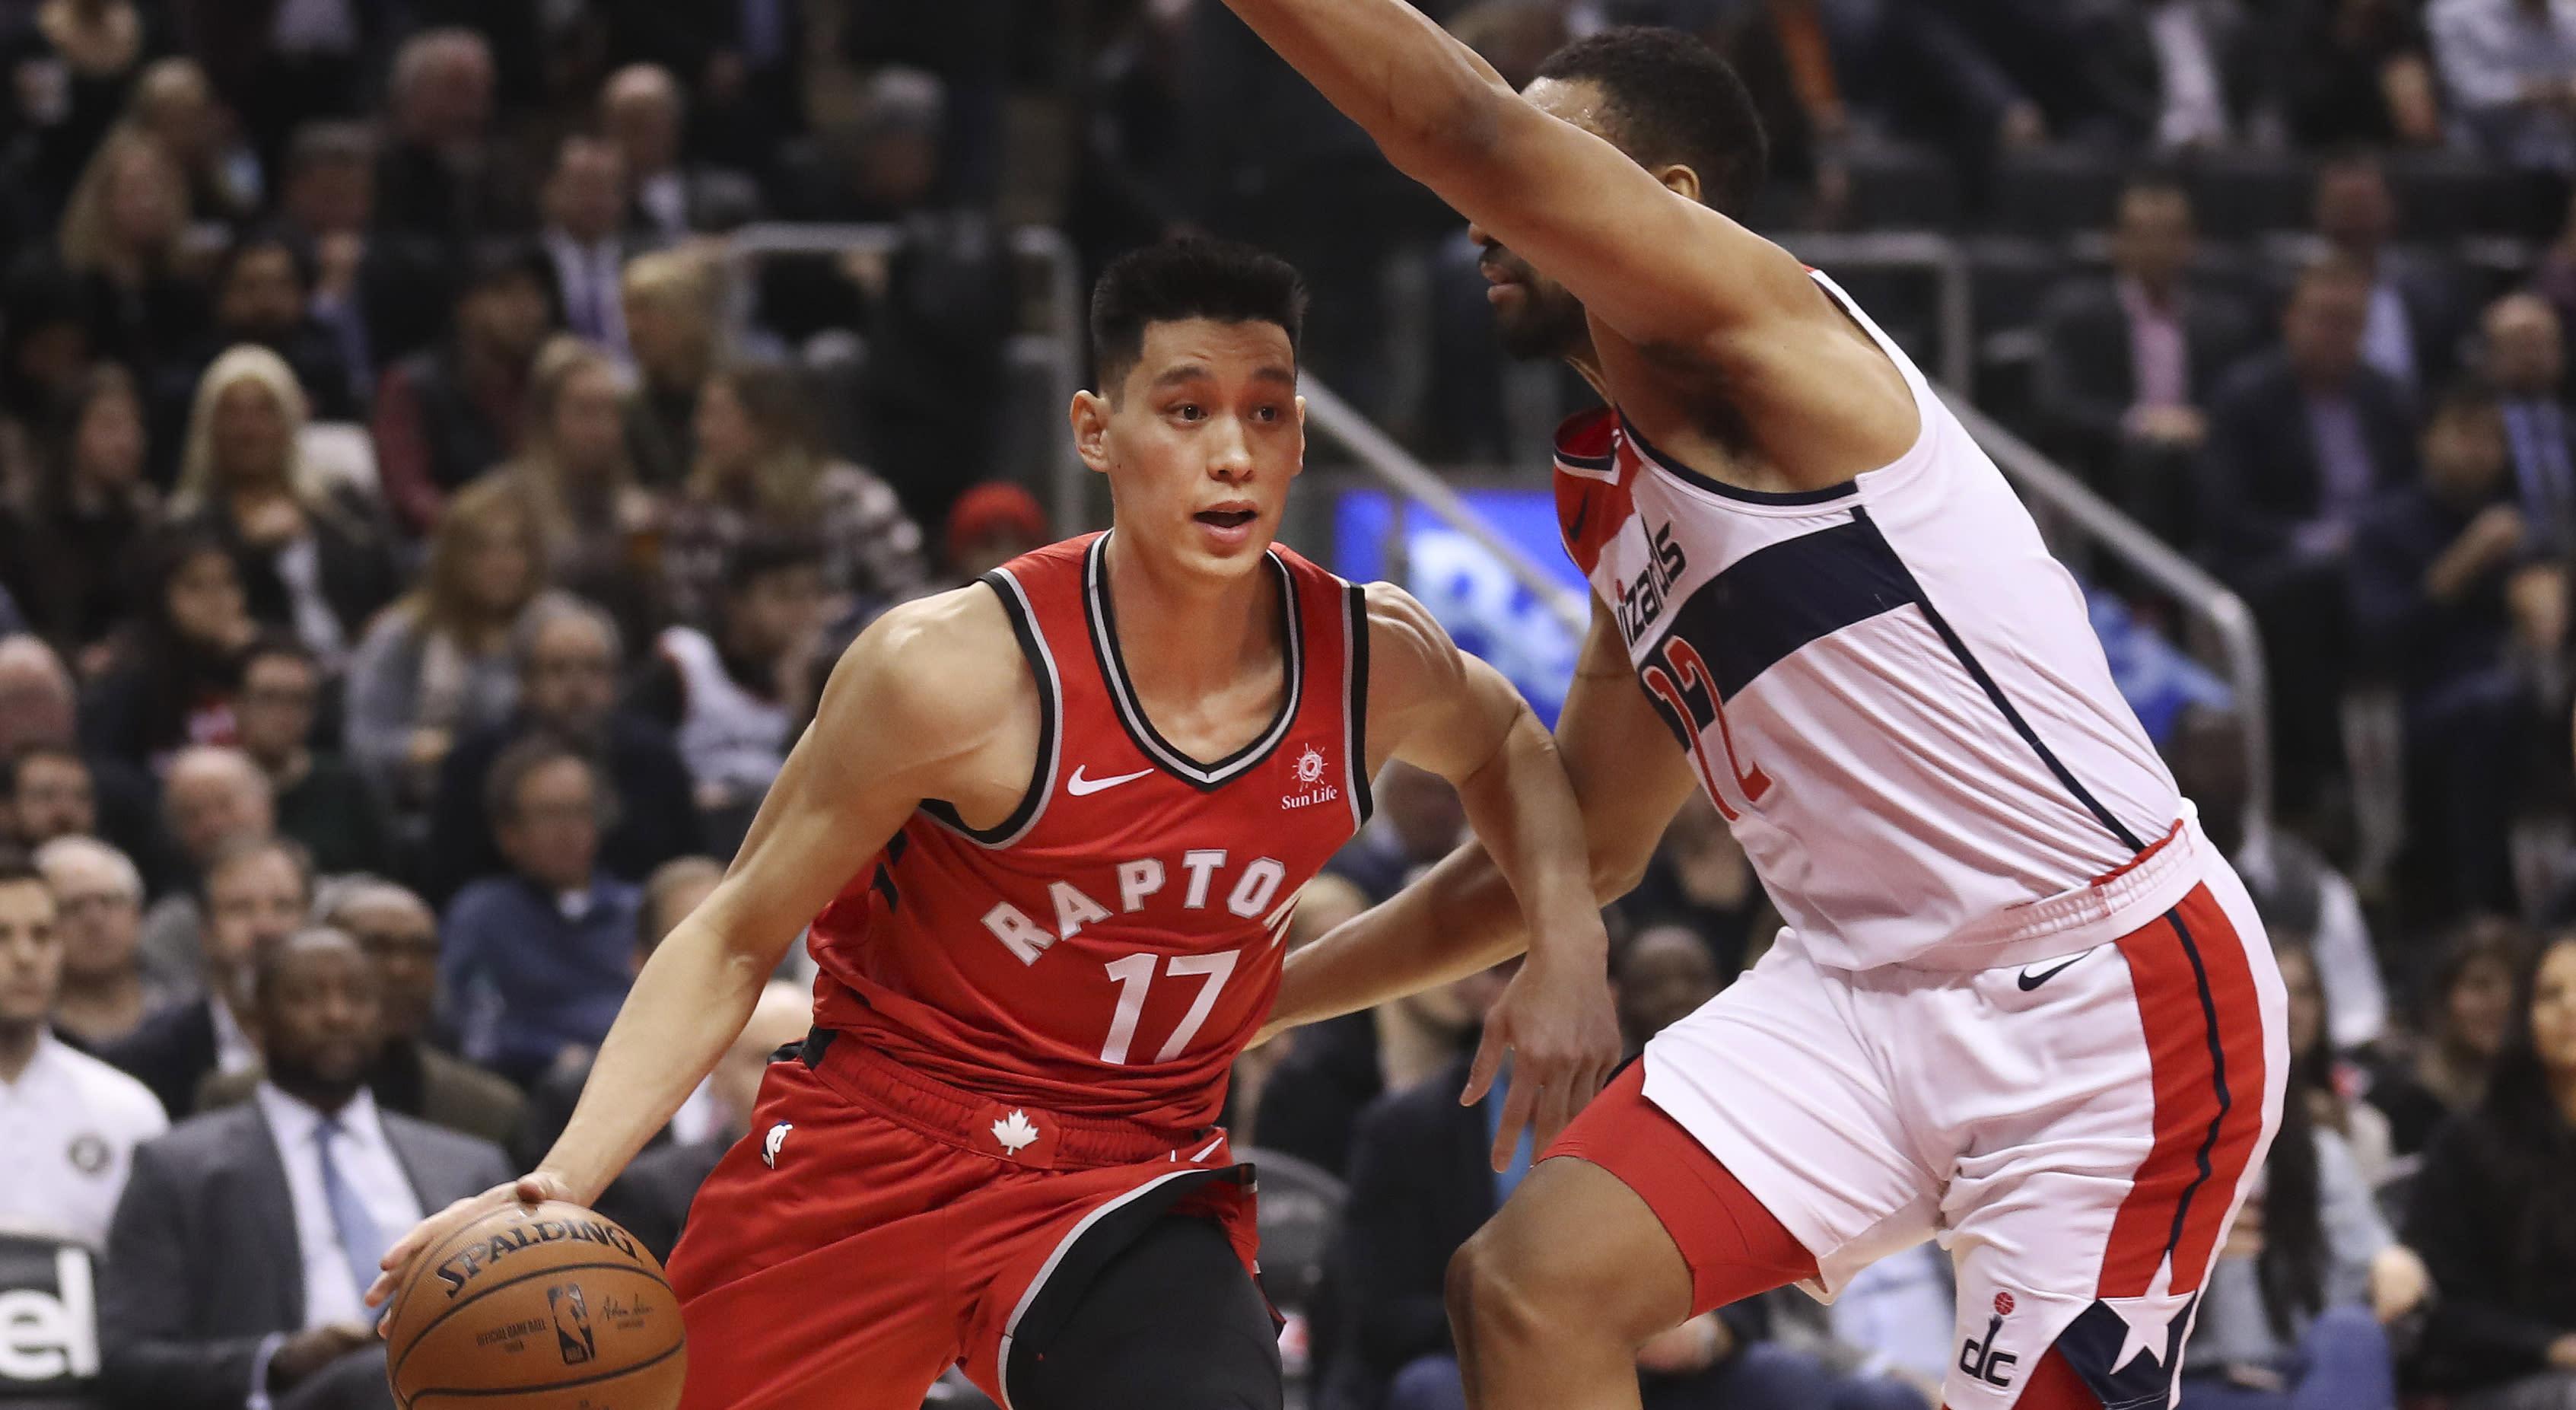 Jeremy Lin Raptors: The Raptors 'Linsanity' Era Officially Begins In Toronto